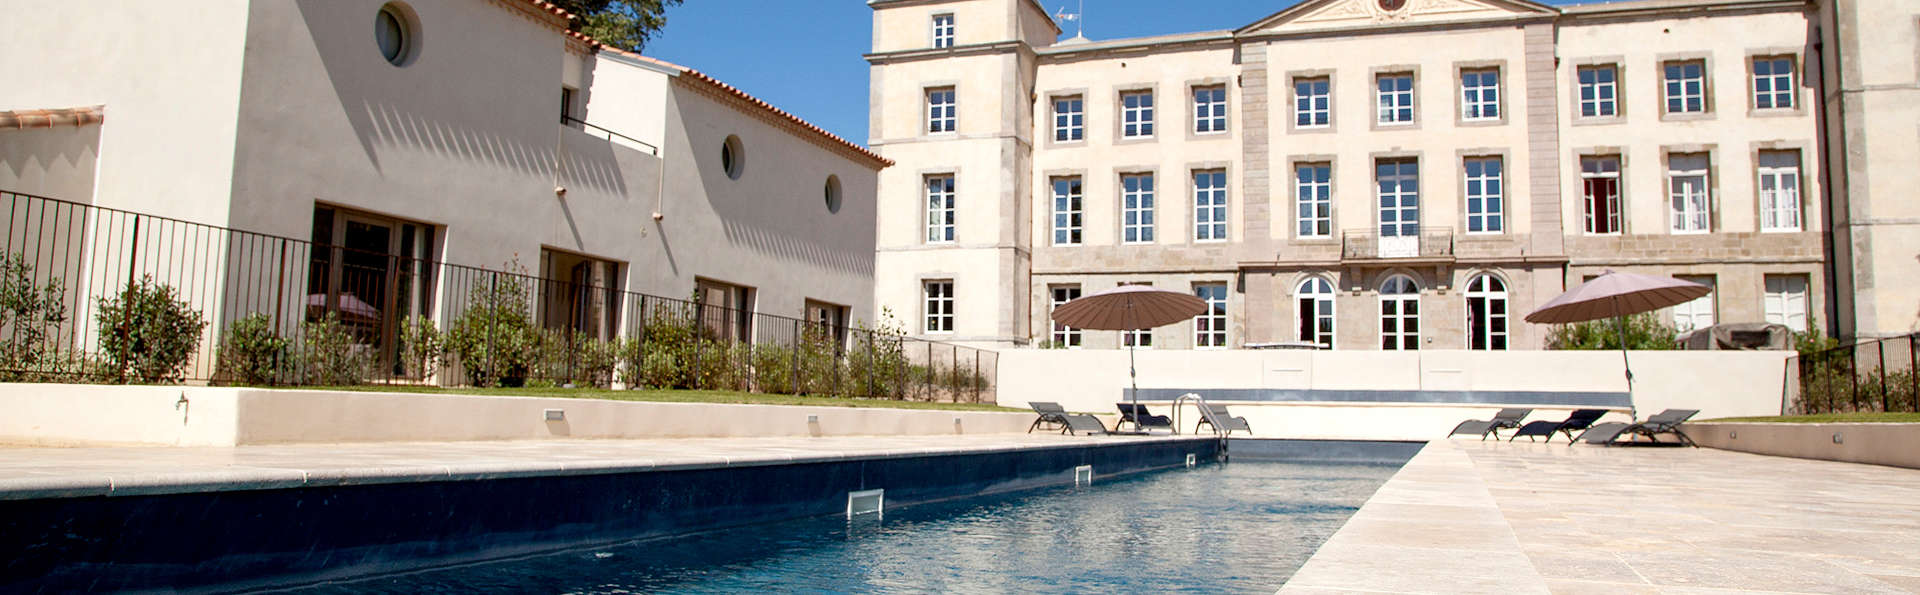 Hotel Ch U00e2teau De La Redorte  U0026 Spa  Hotel La Redorte